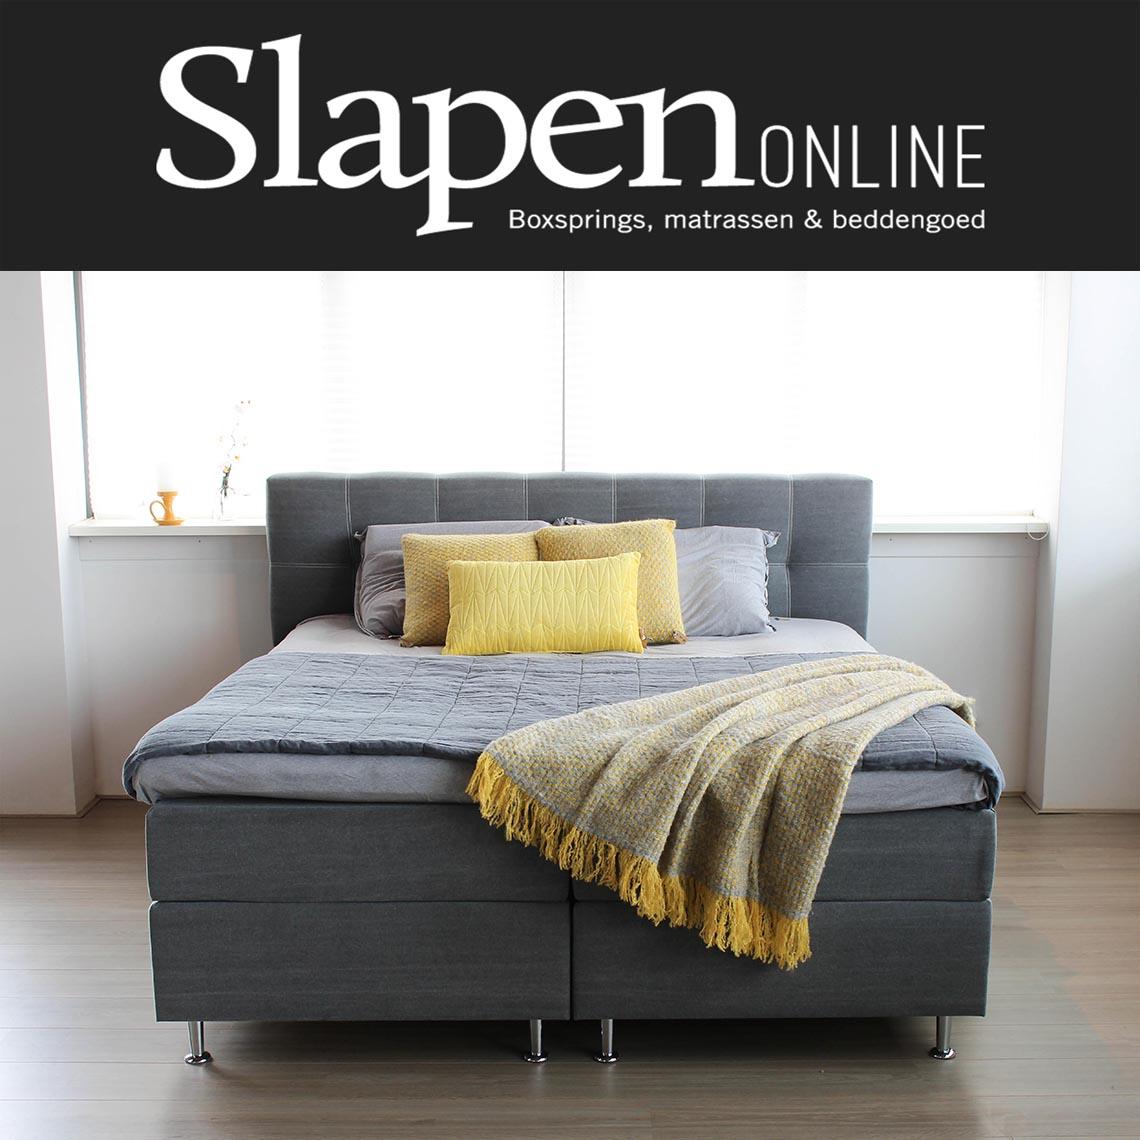 boxspring bed 120x200 bij slapen online slapen online. Black Bedroom Furniture Sets. Home Design Ideas